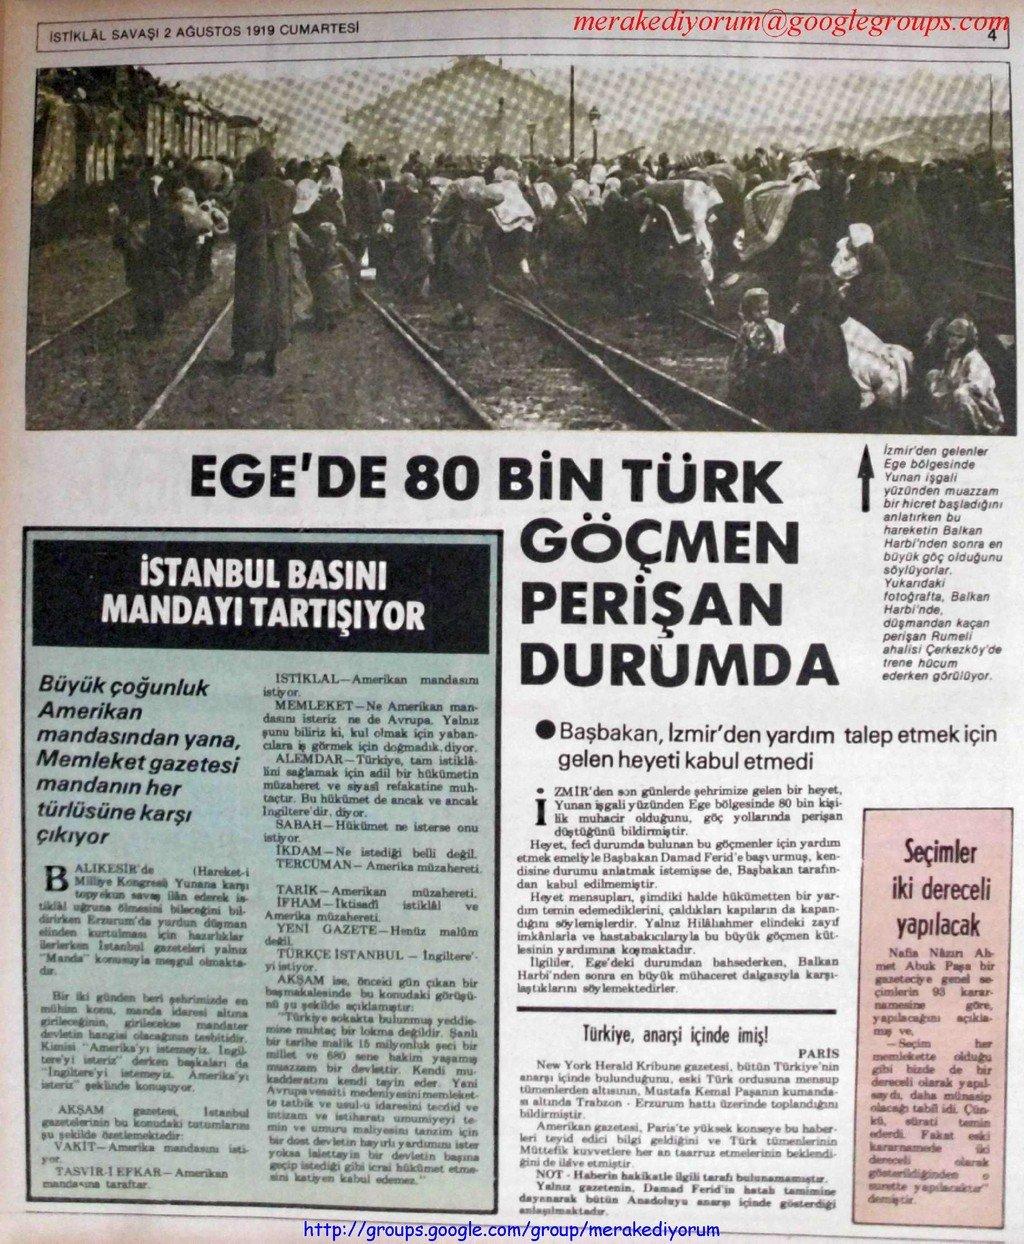 istiklal savaşı gazetesi - 2 ağustos 1919